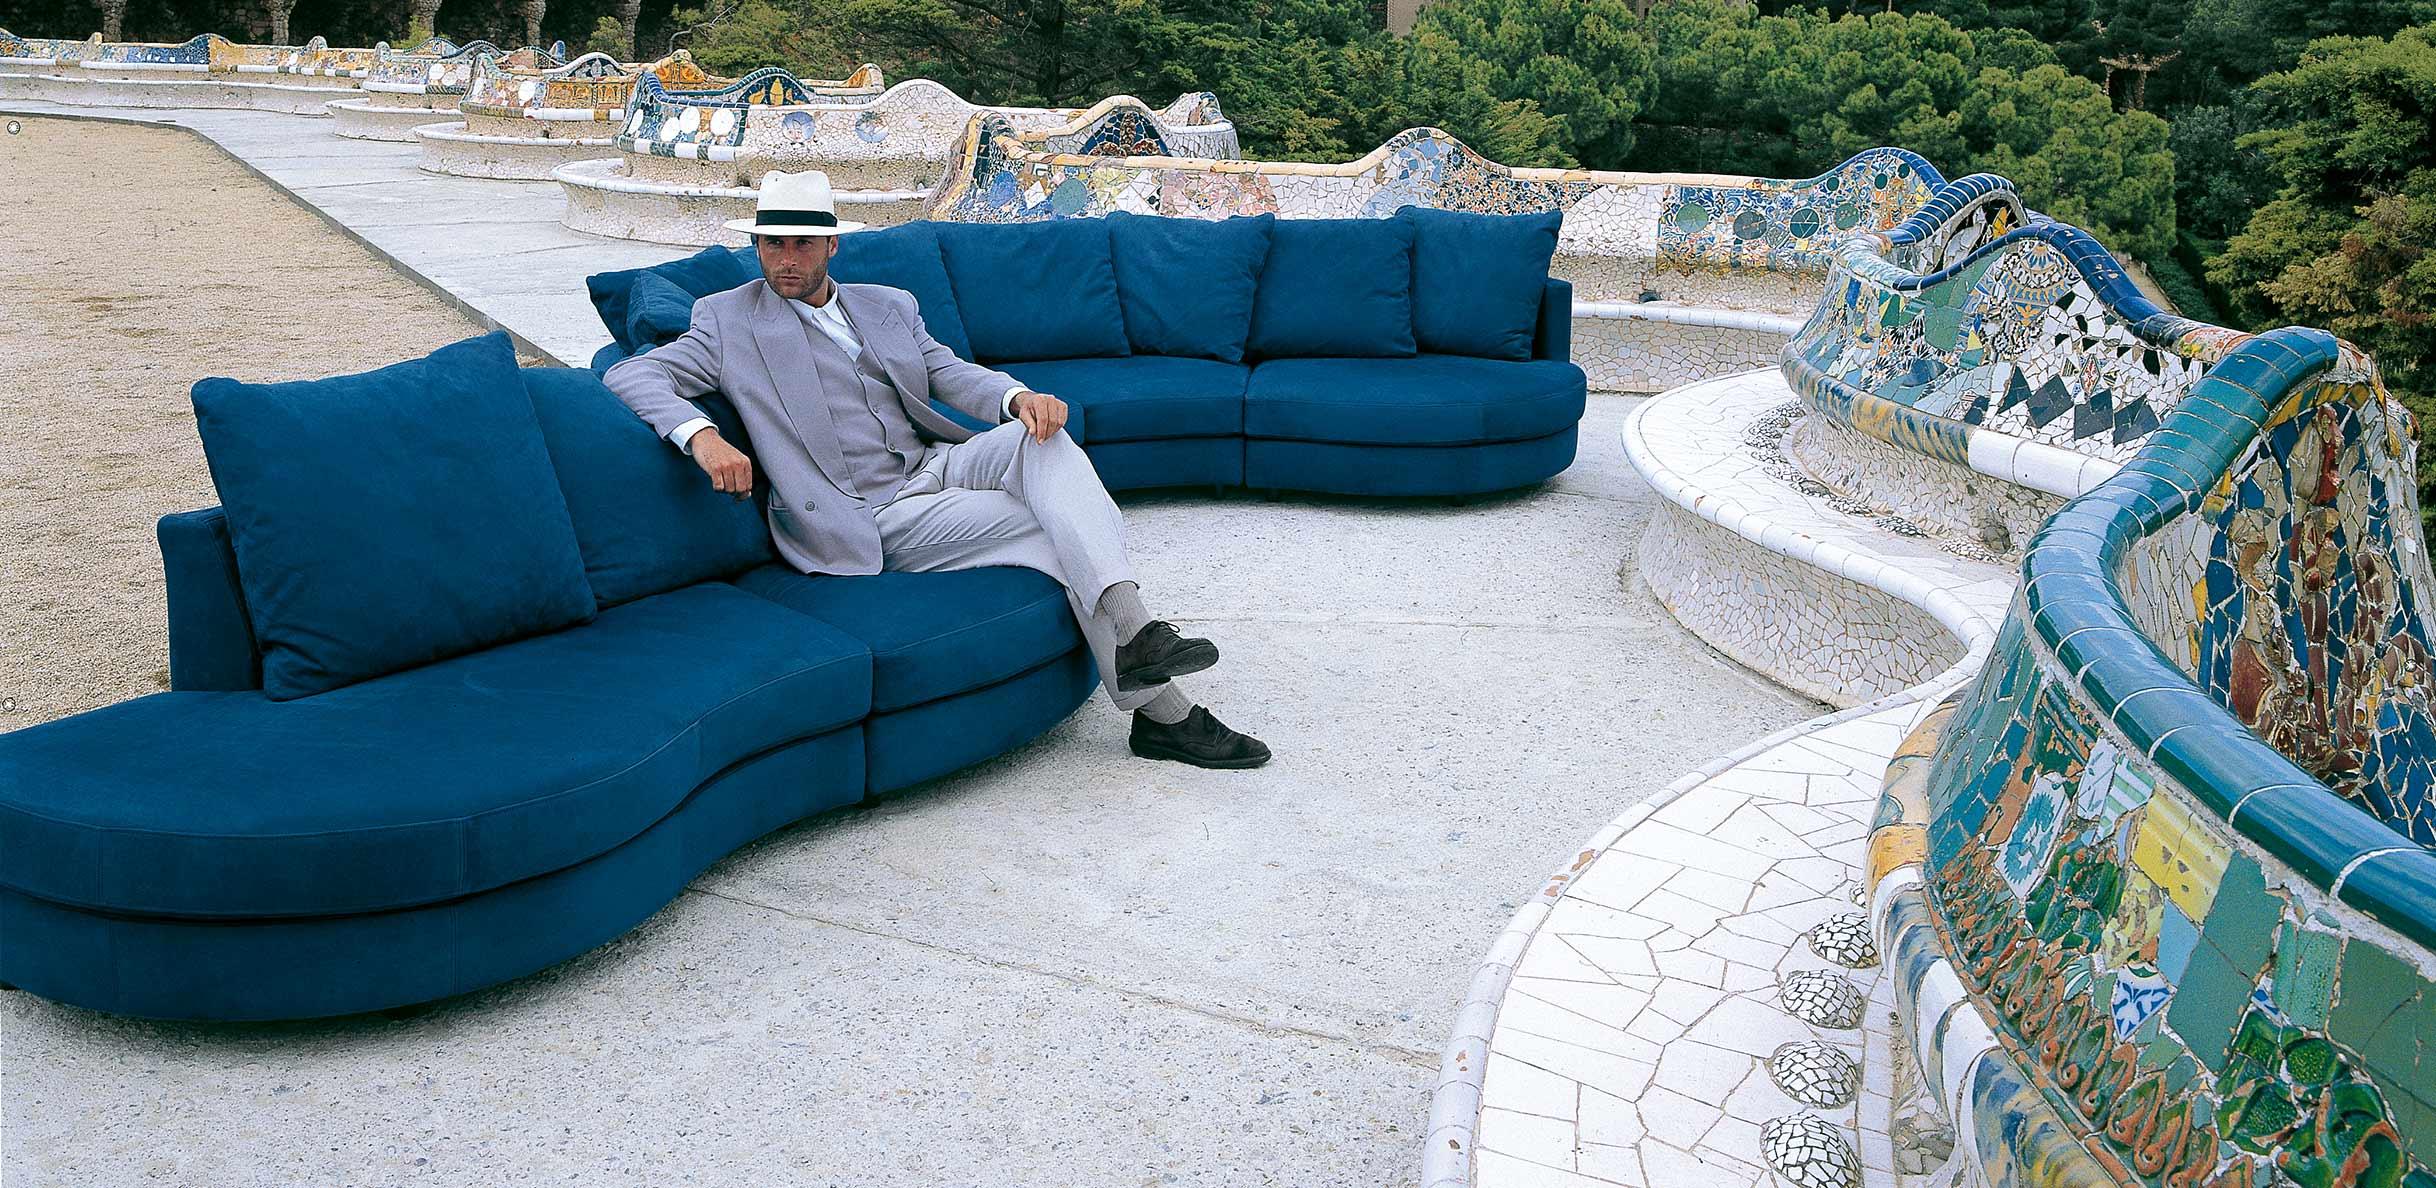 rolf benz sofa 2500 sofa the honoroak. Black Bedroom Furniture Sets. Home Design Ideas